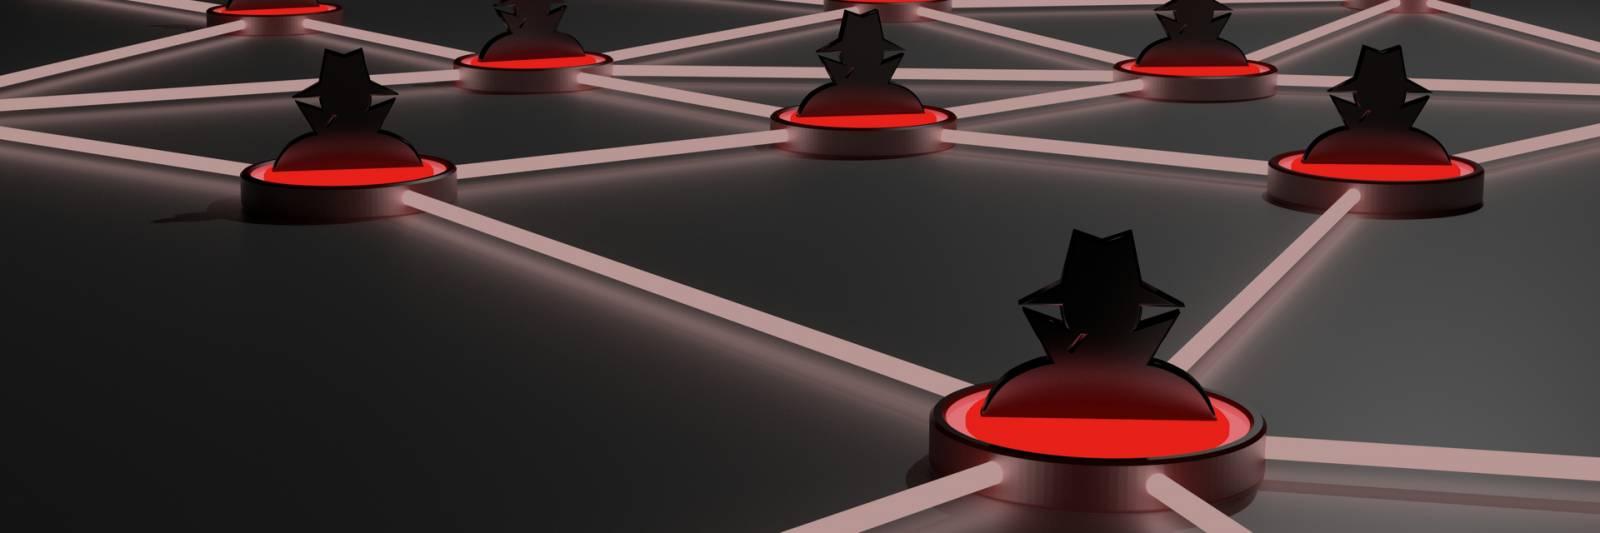 Cms Platforms Succumb To Kashmirblack Botnet As Businesses Rush Online